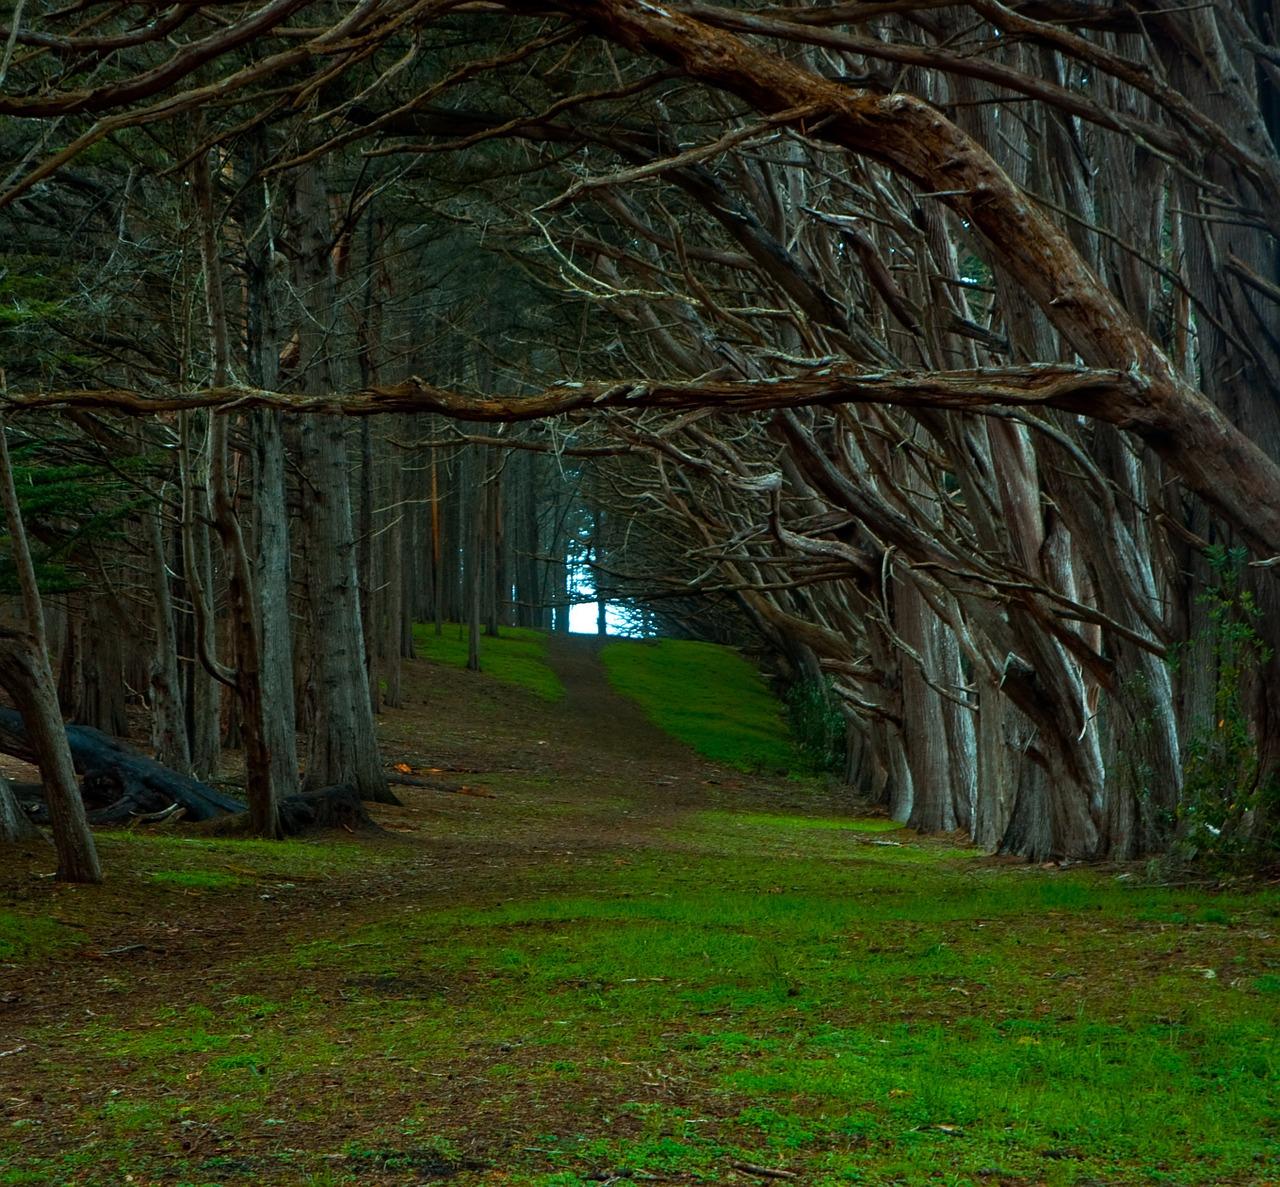 forest-696838_1280.jpg